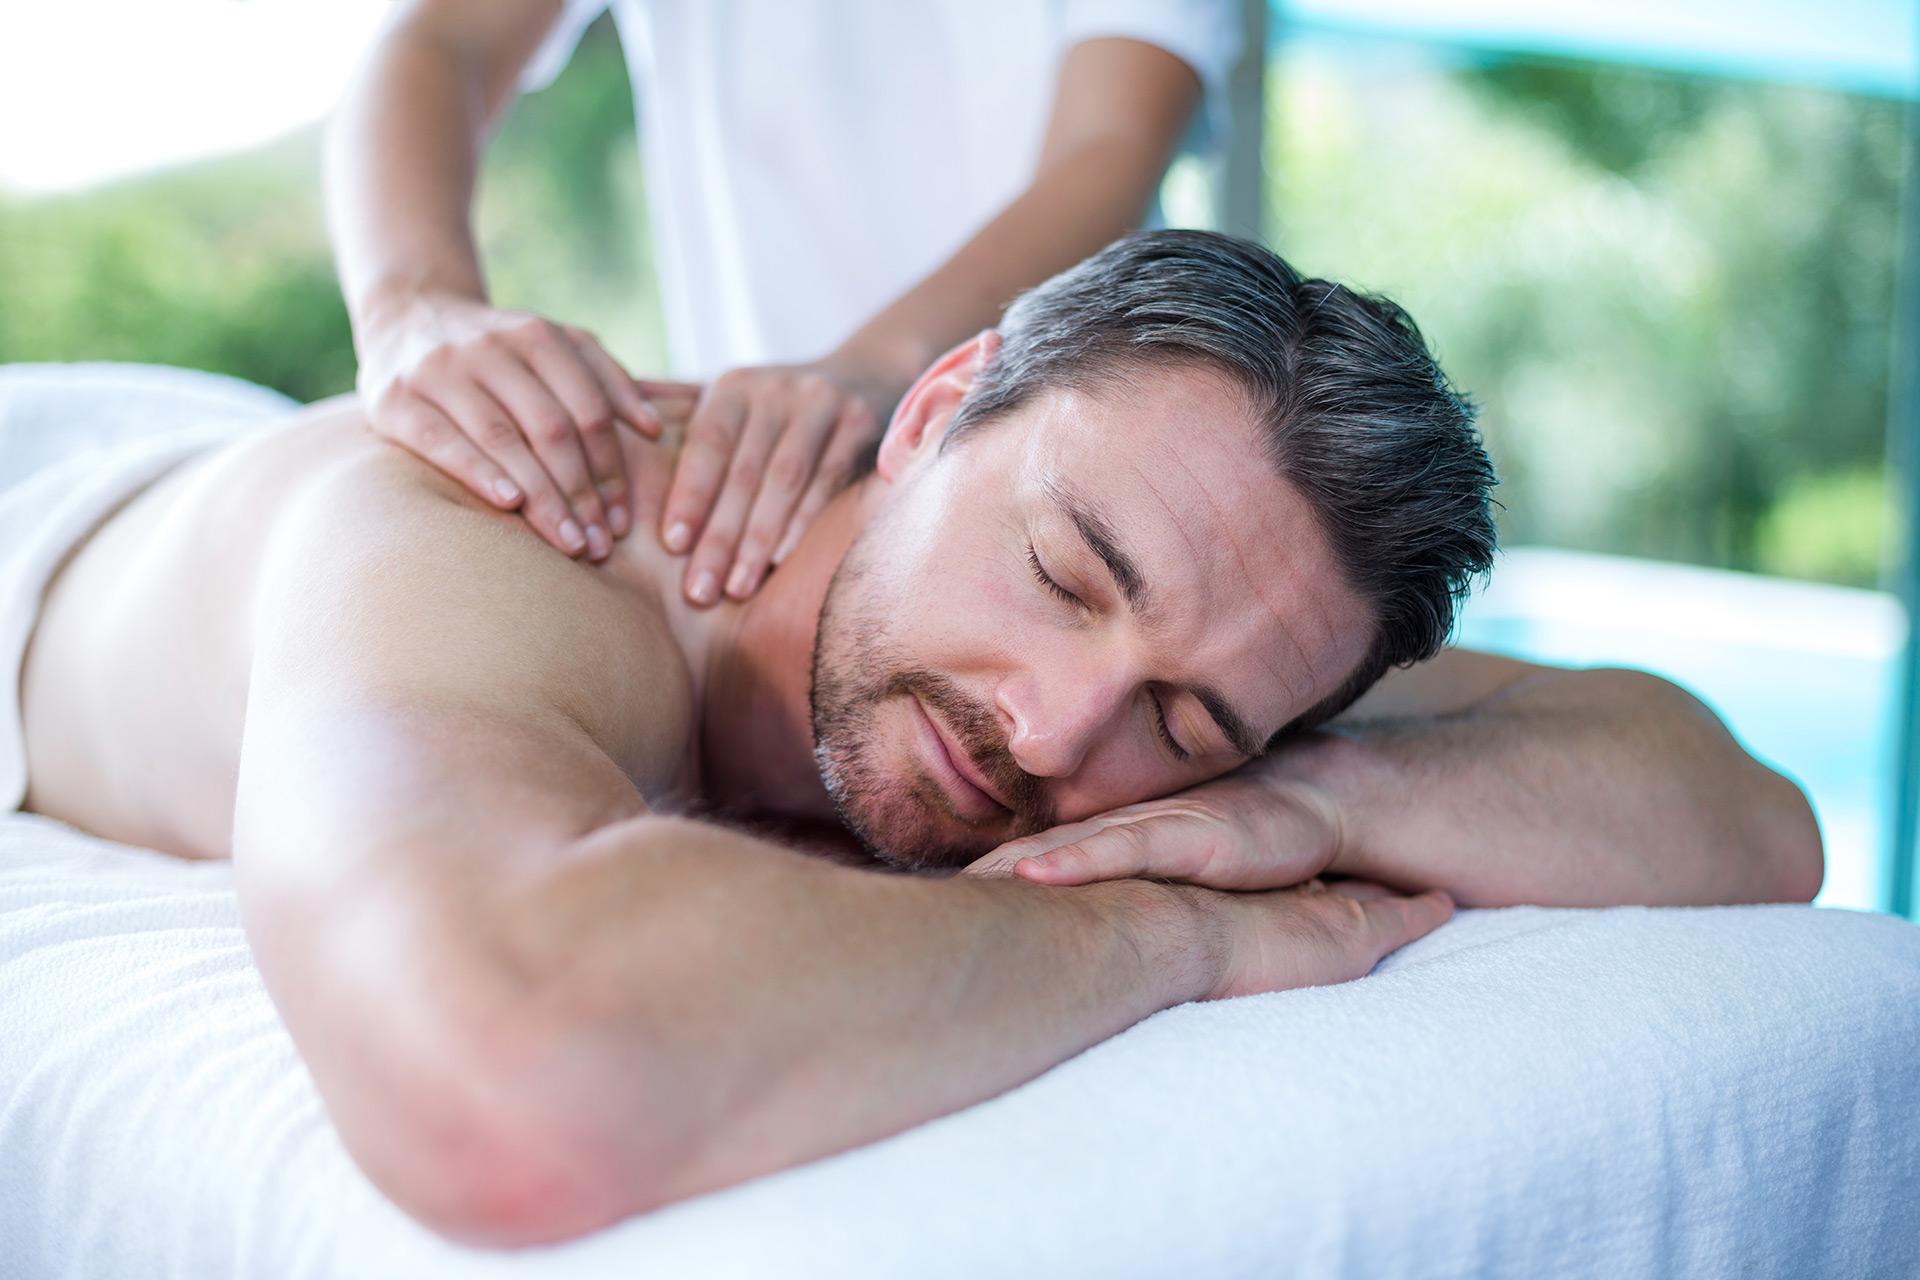 Handsome man massage stock photo footage